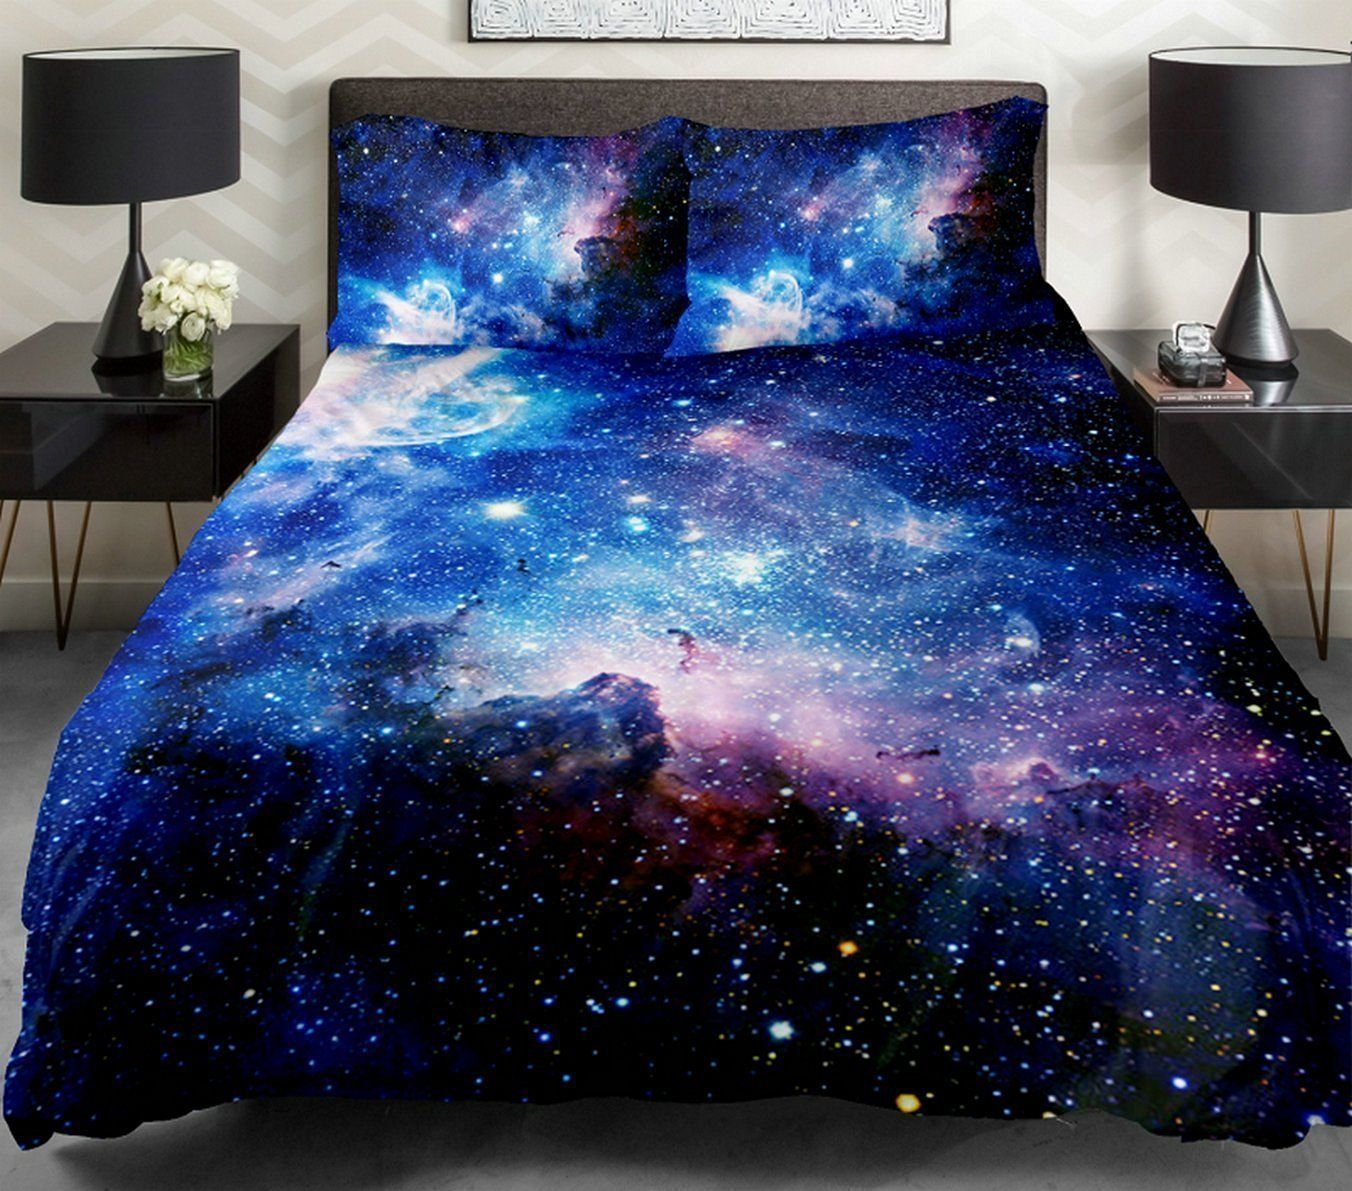 Best Amazon Com Anlye 4Pcs Full Size Galaxy Bedding Sets Cotton Bedroom Set With 1 Cotton Sheet 1 400 x 300